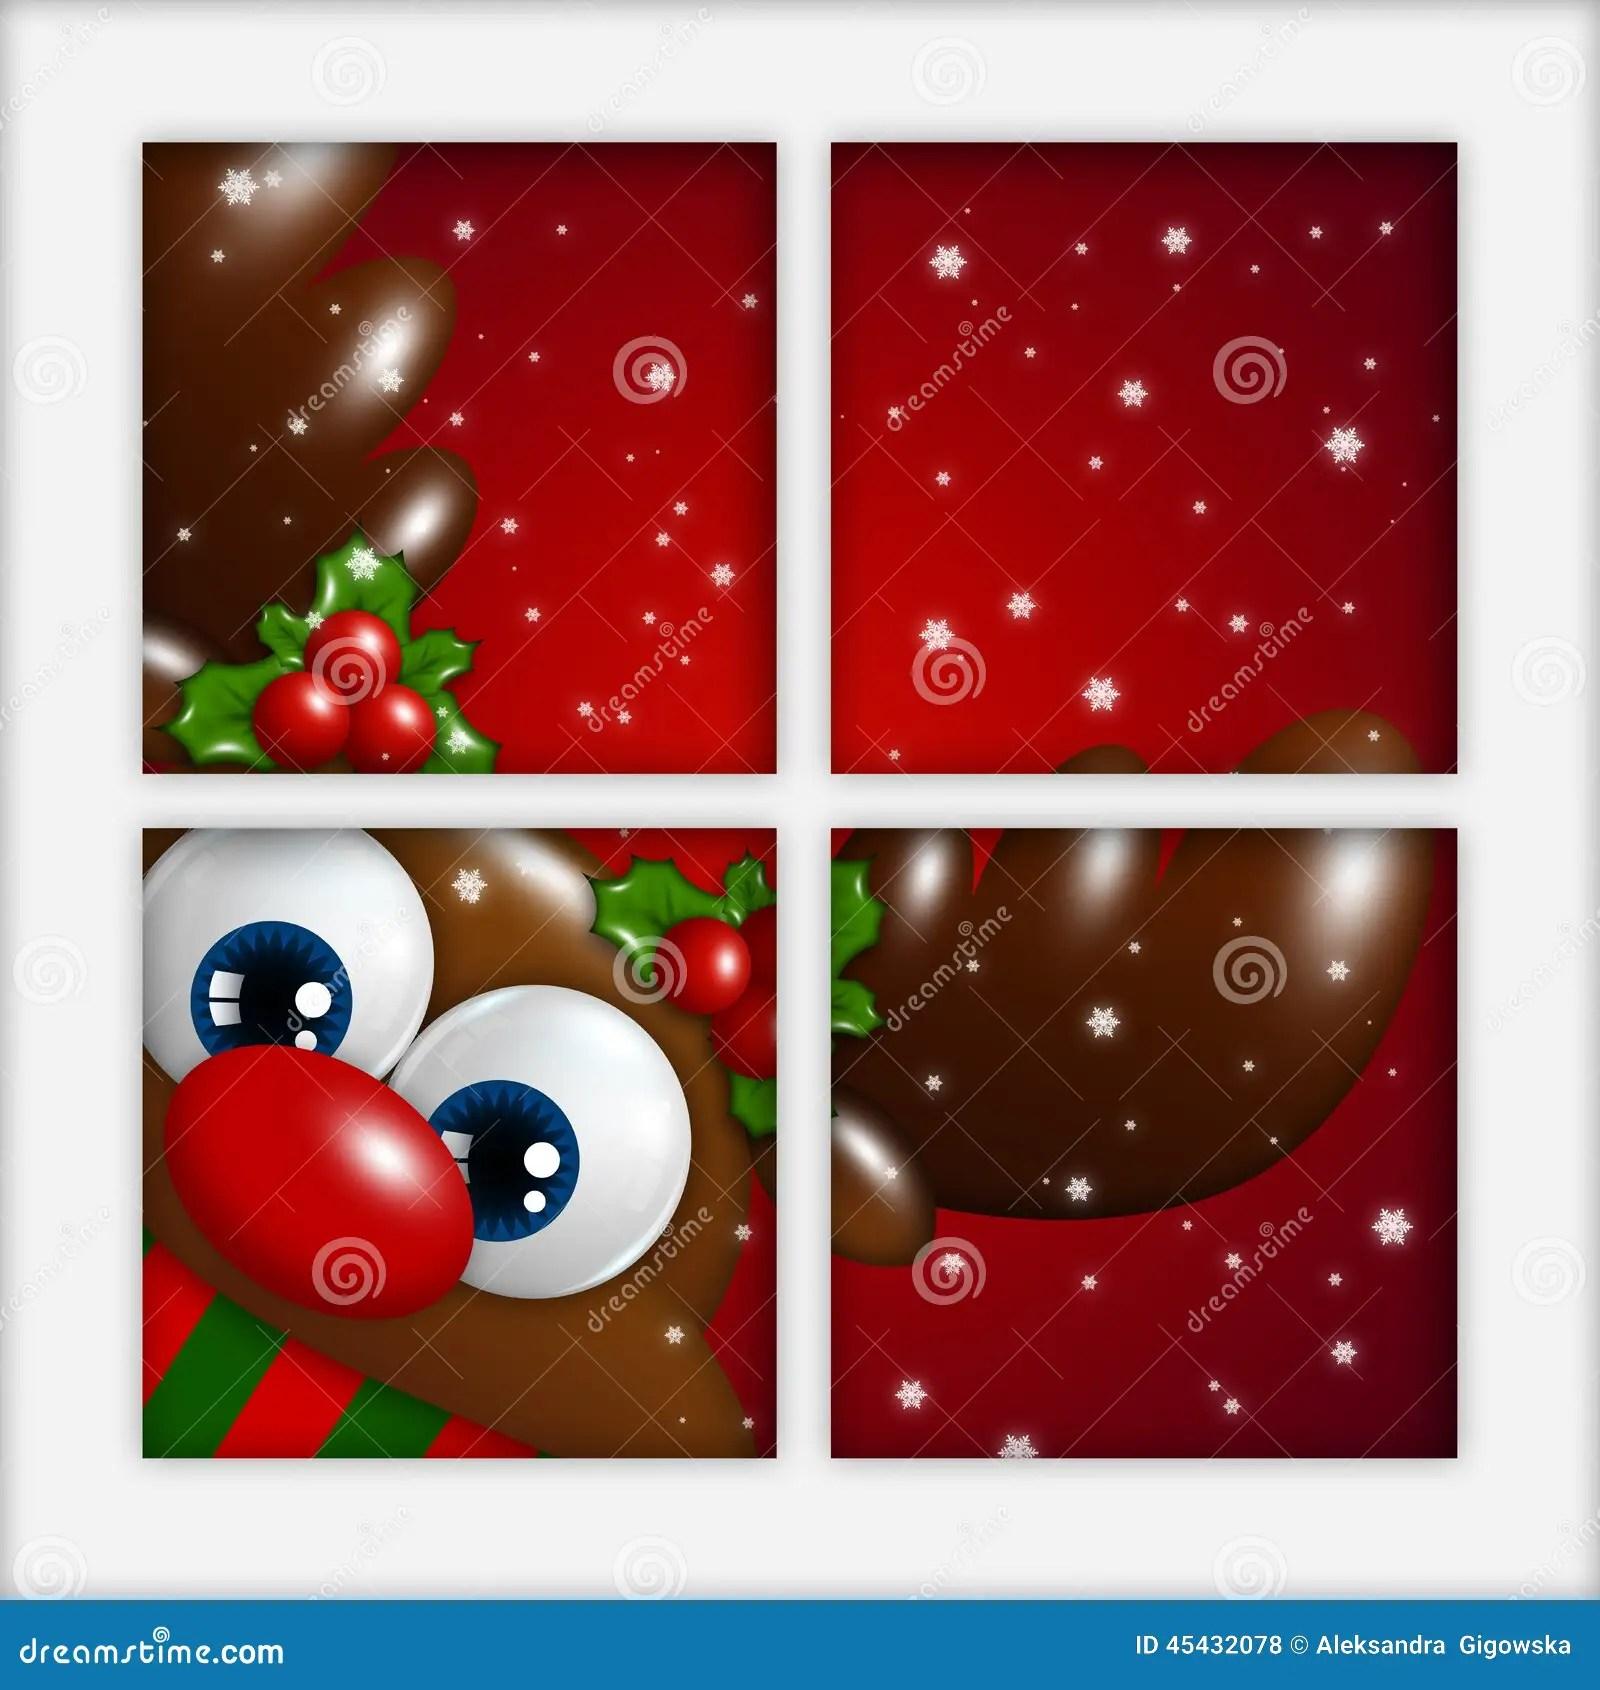 Christmas Reindeer Looking By The Window Stock